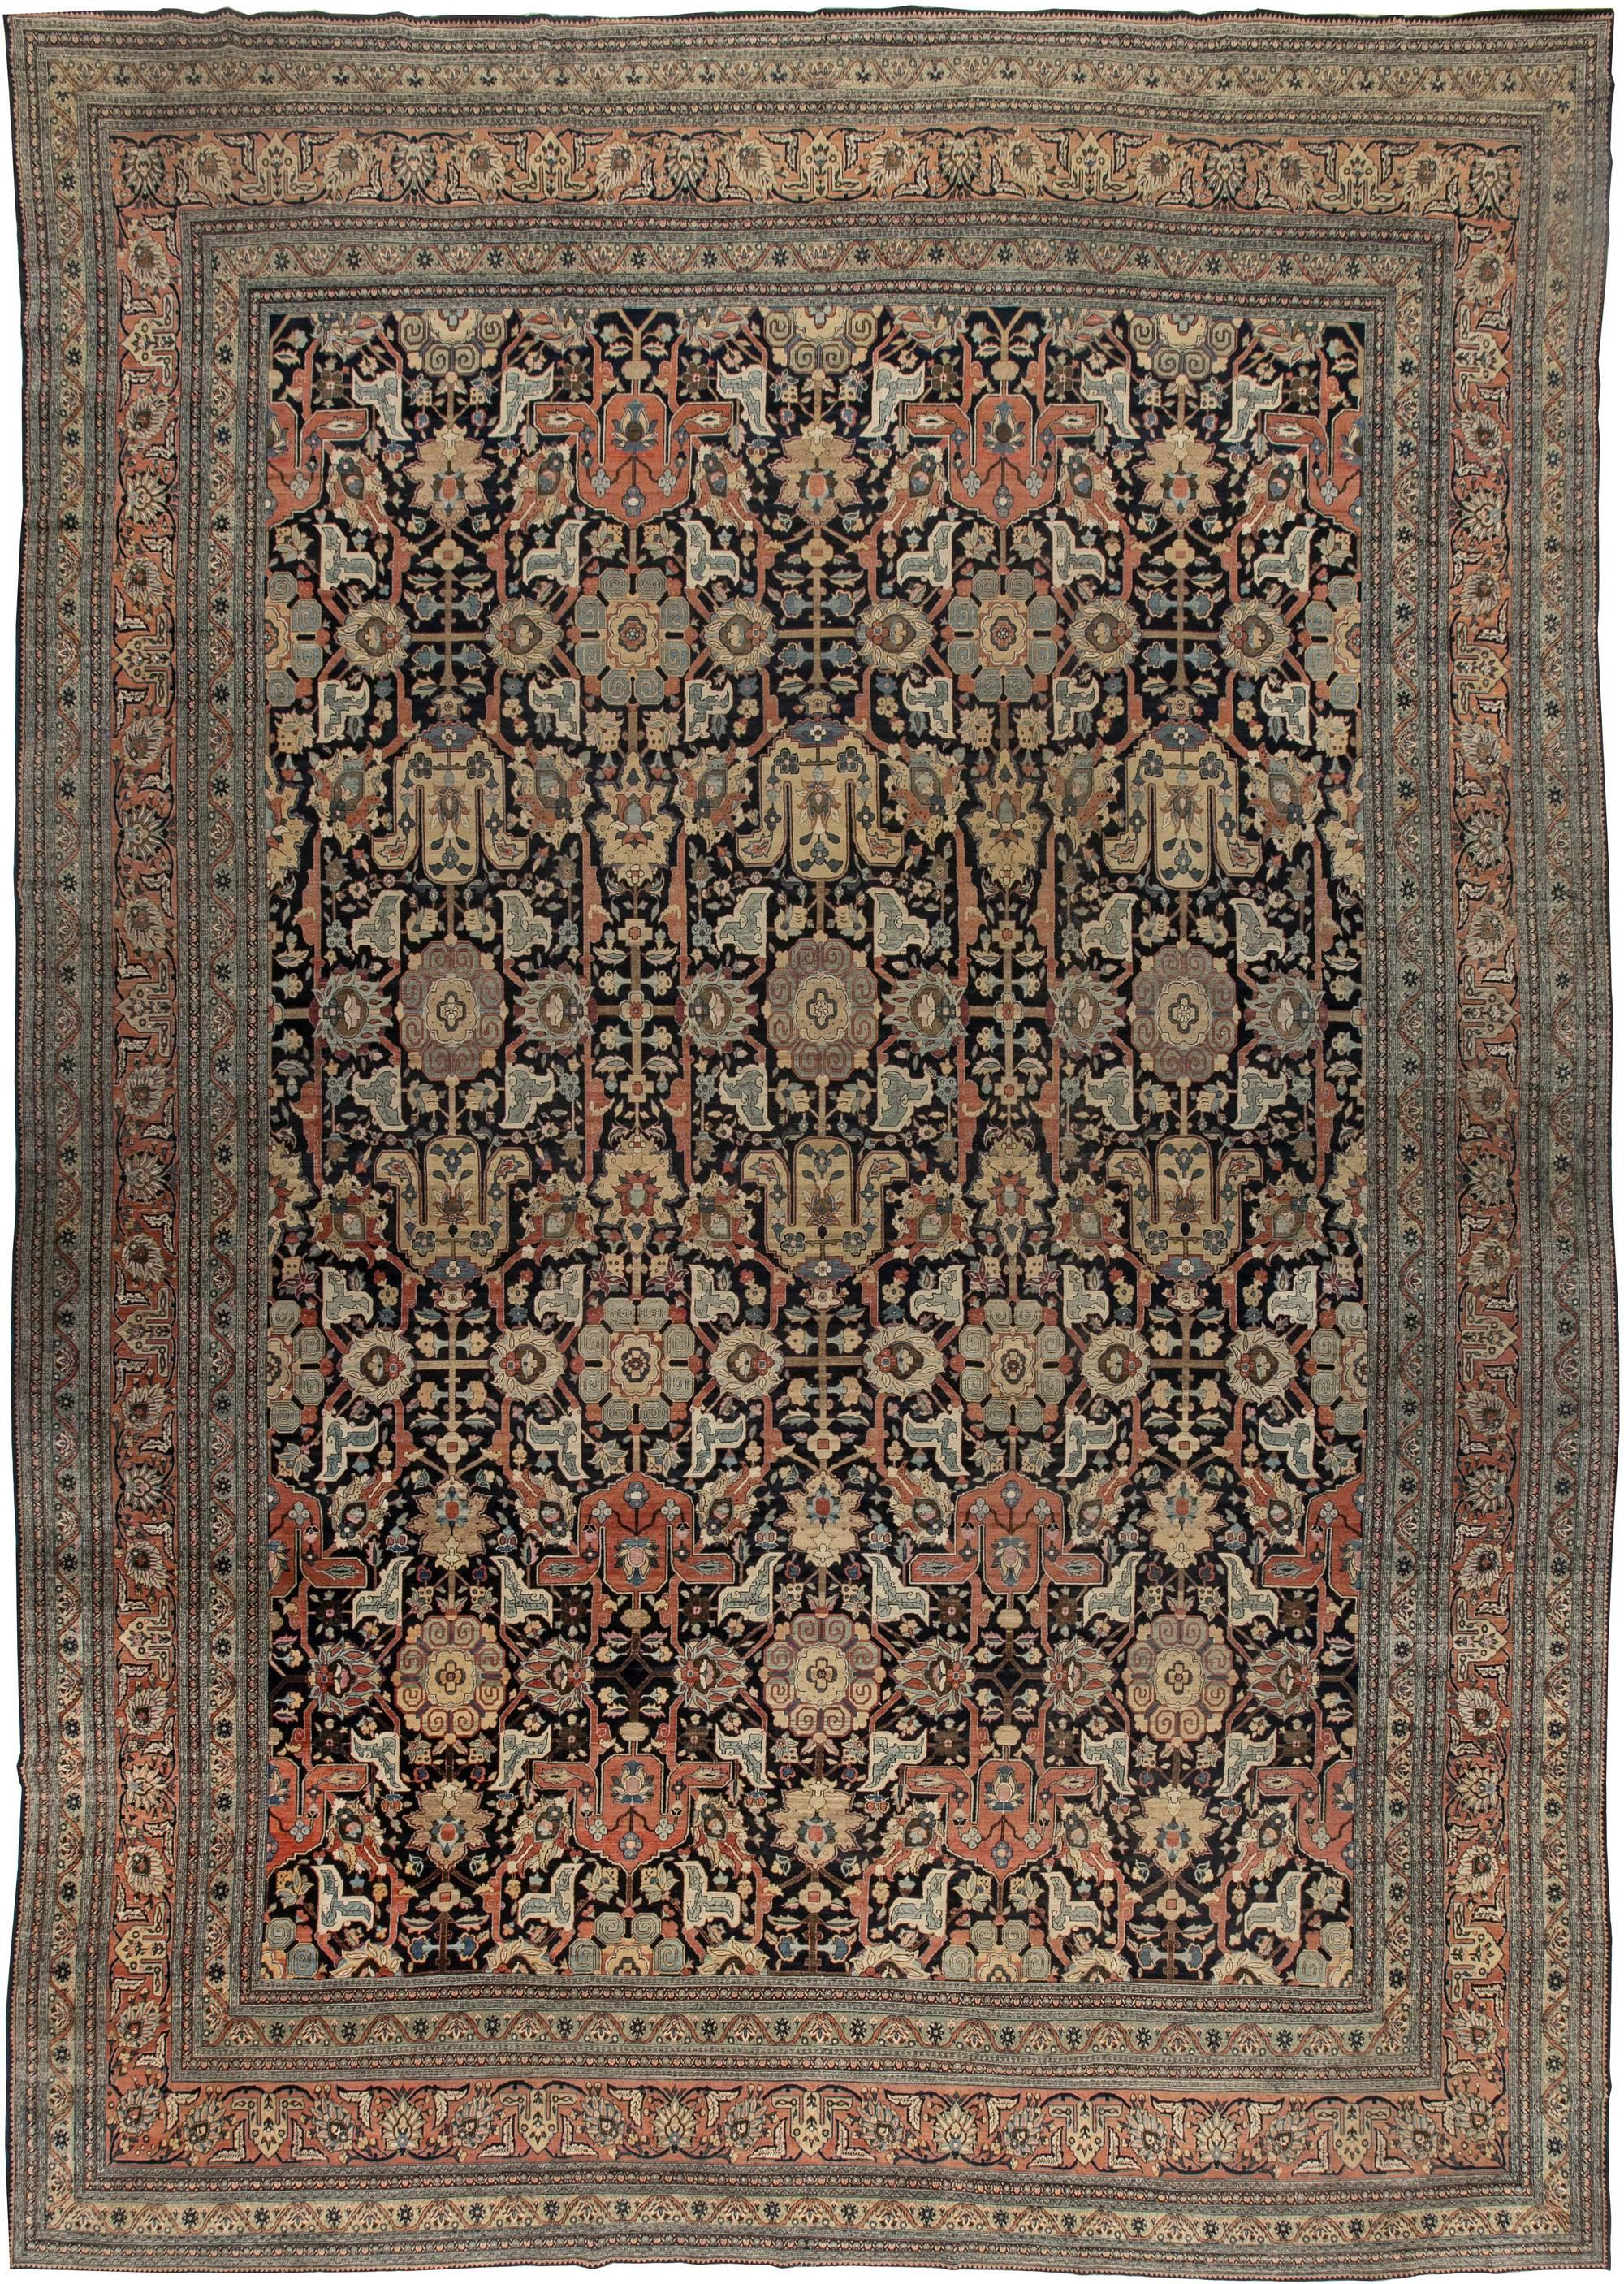 Large Antique Persian Tabriz Rug BB4493